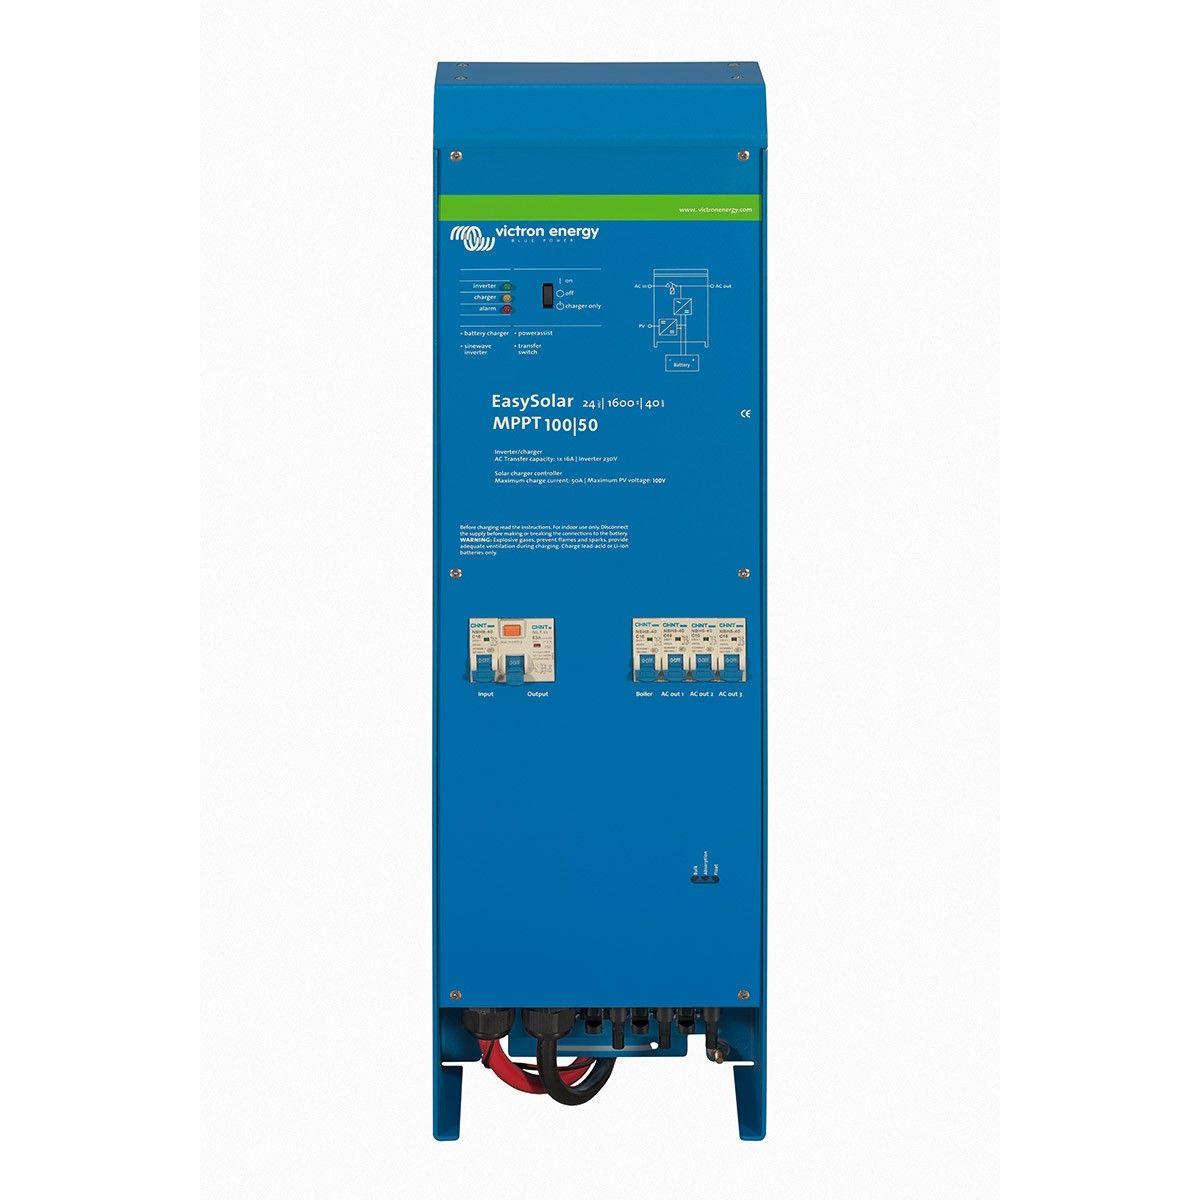 EasySolar 24 1600 40-16 MPPT 100 50 Victron Energy